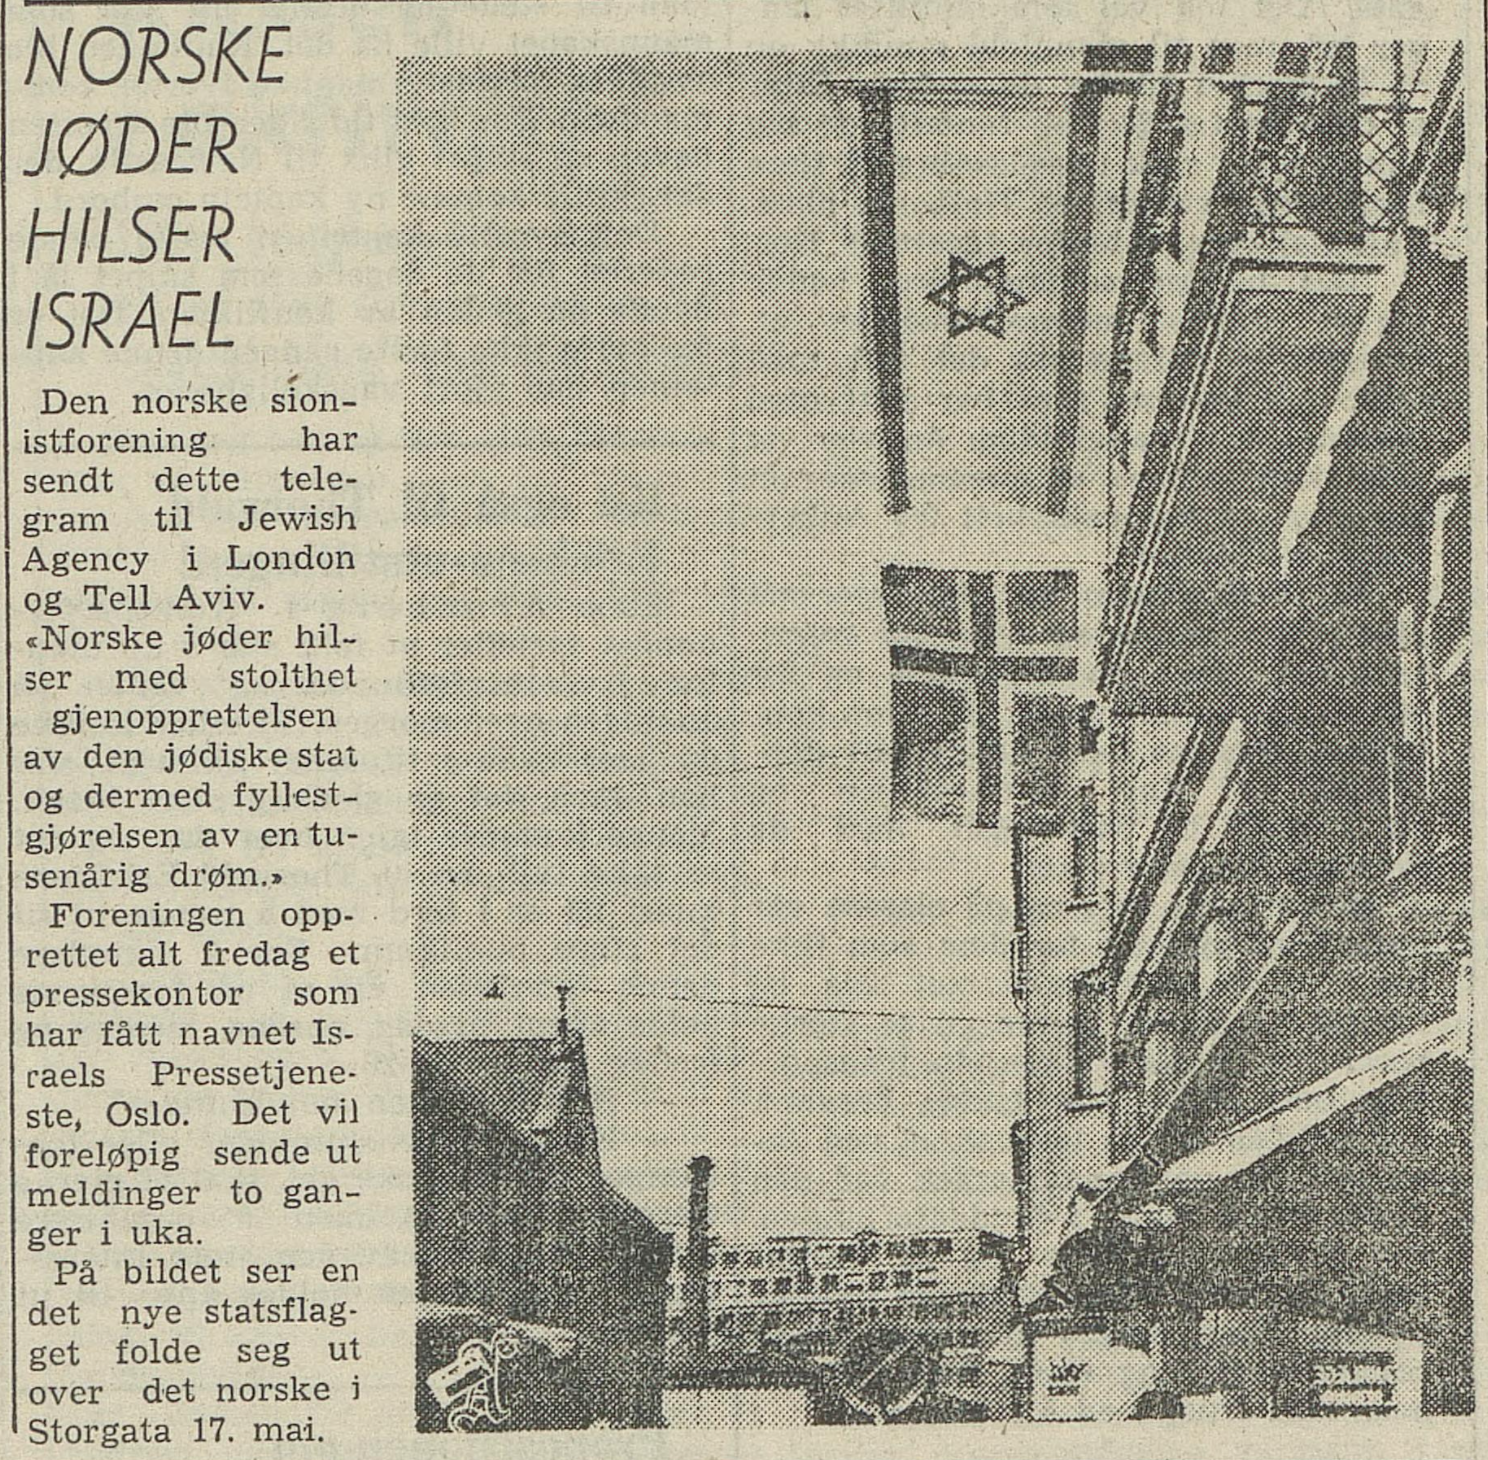 Arbeiderbladet  viser det jødiske flagget vaie på 17. mai i Oslo utanfor Den norske sionistforening, (18. mai 1948)